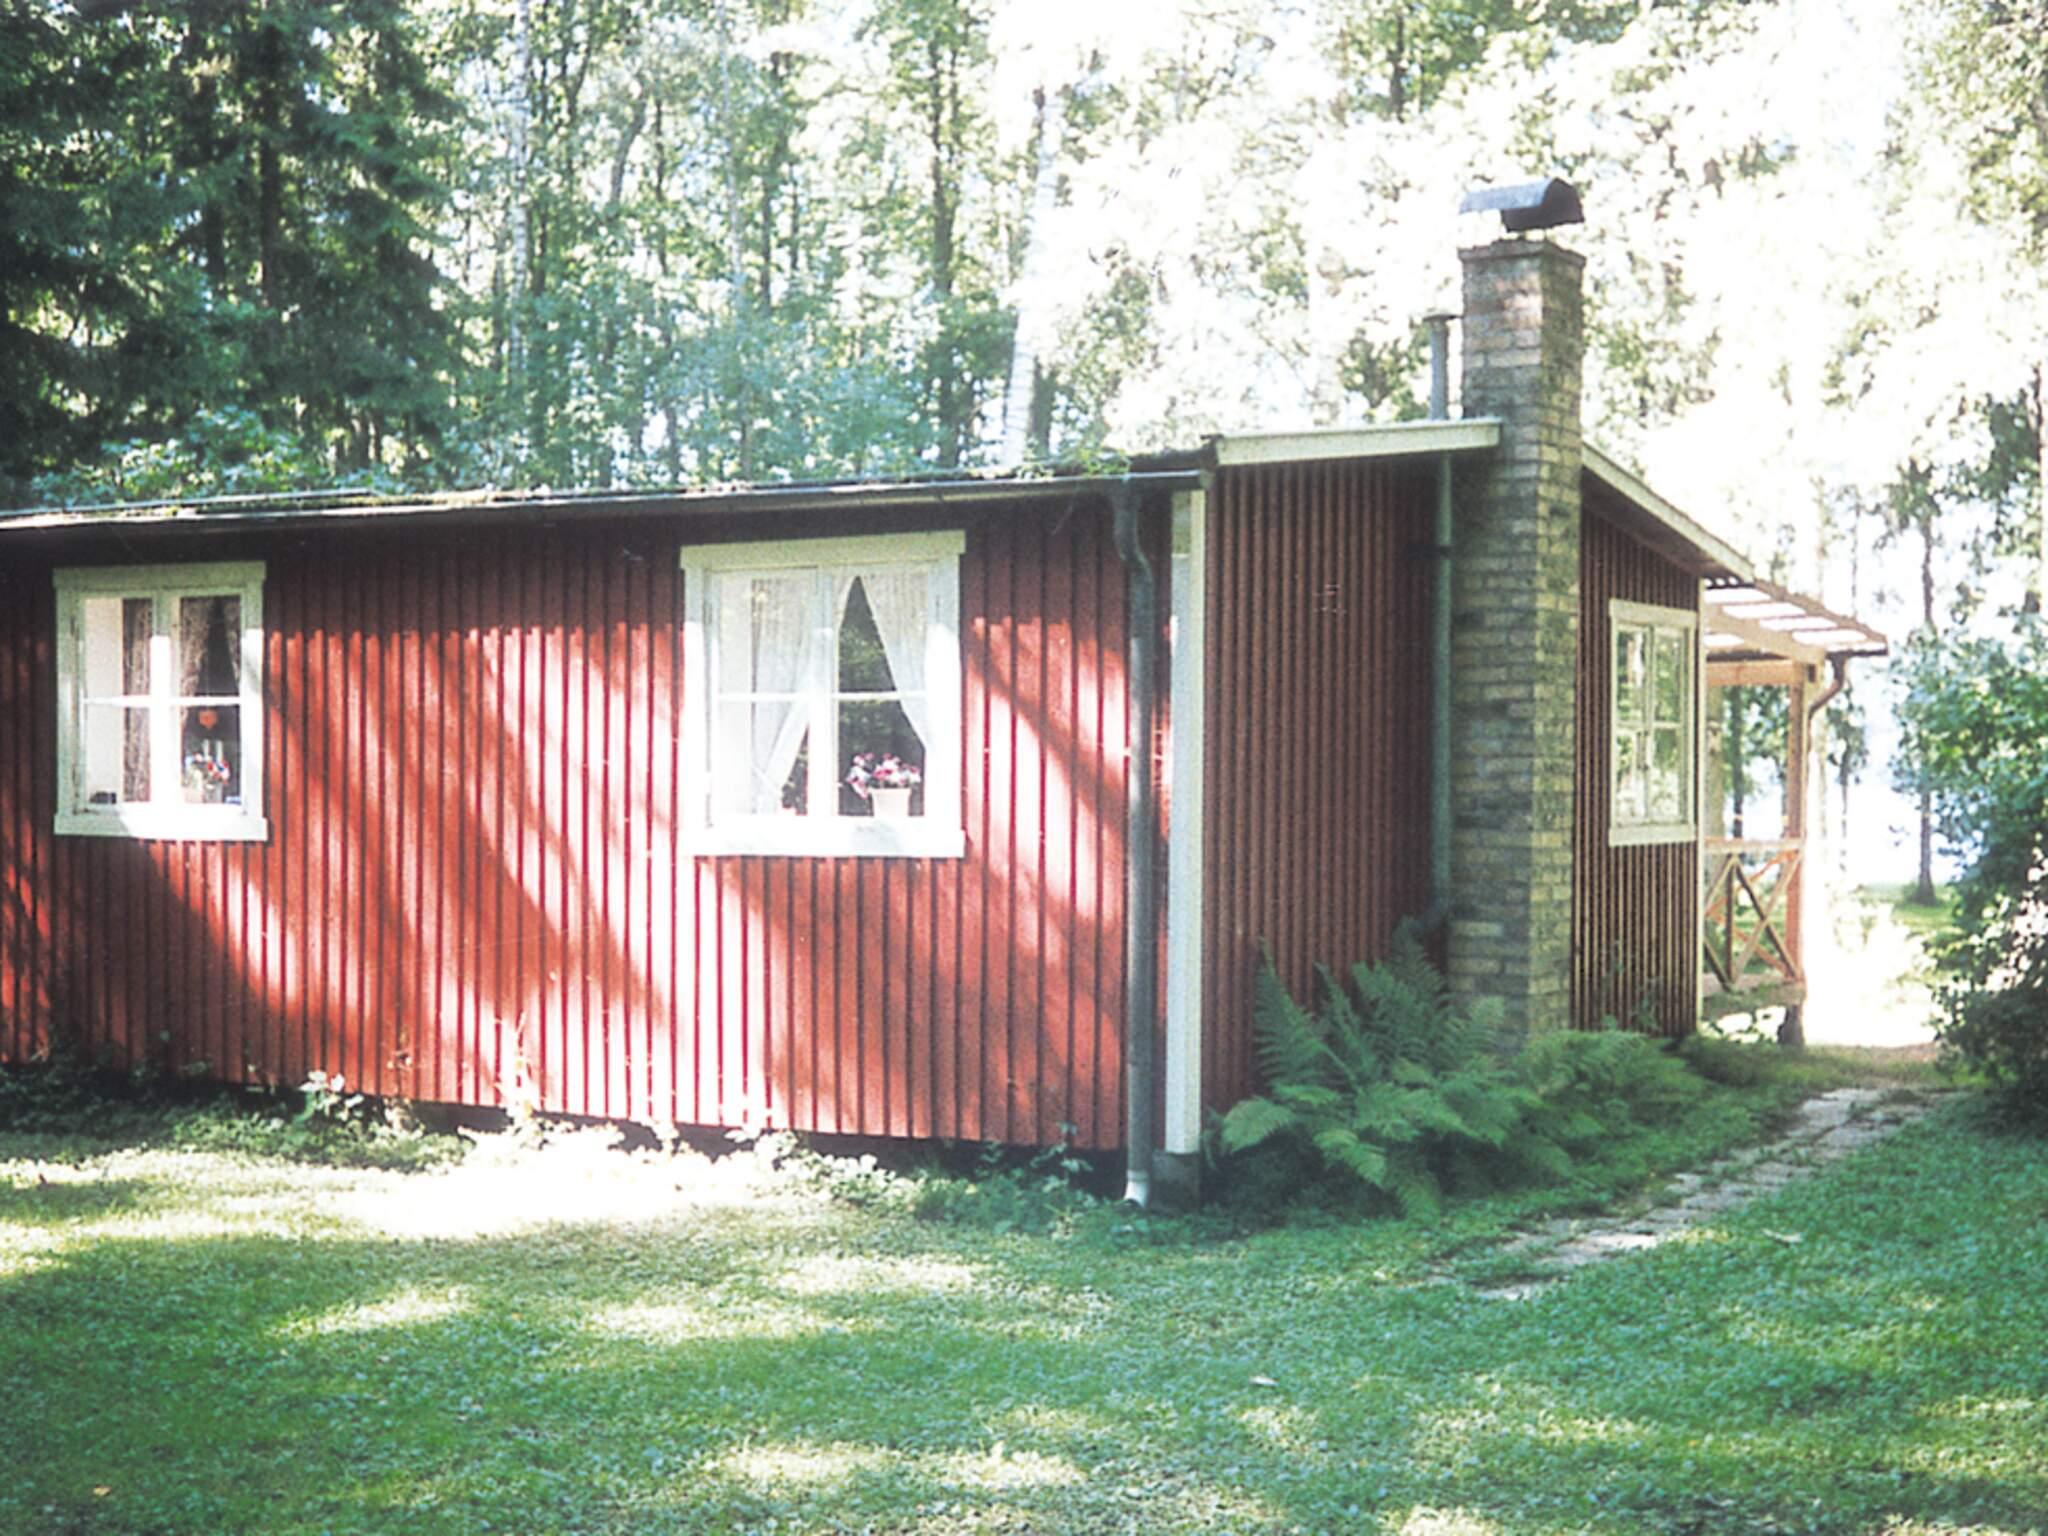 Ferienhaus Melldala (82042), Lerdala, Västra Götaland län, Westschweden, Schweden, Bild 13